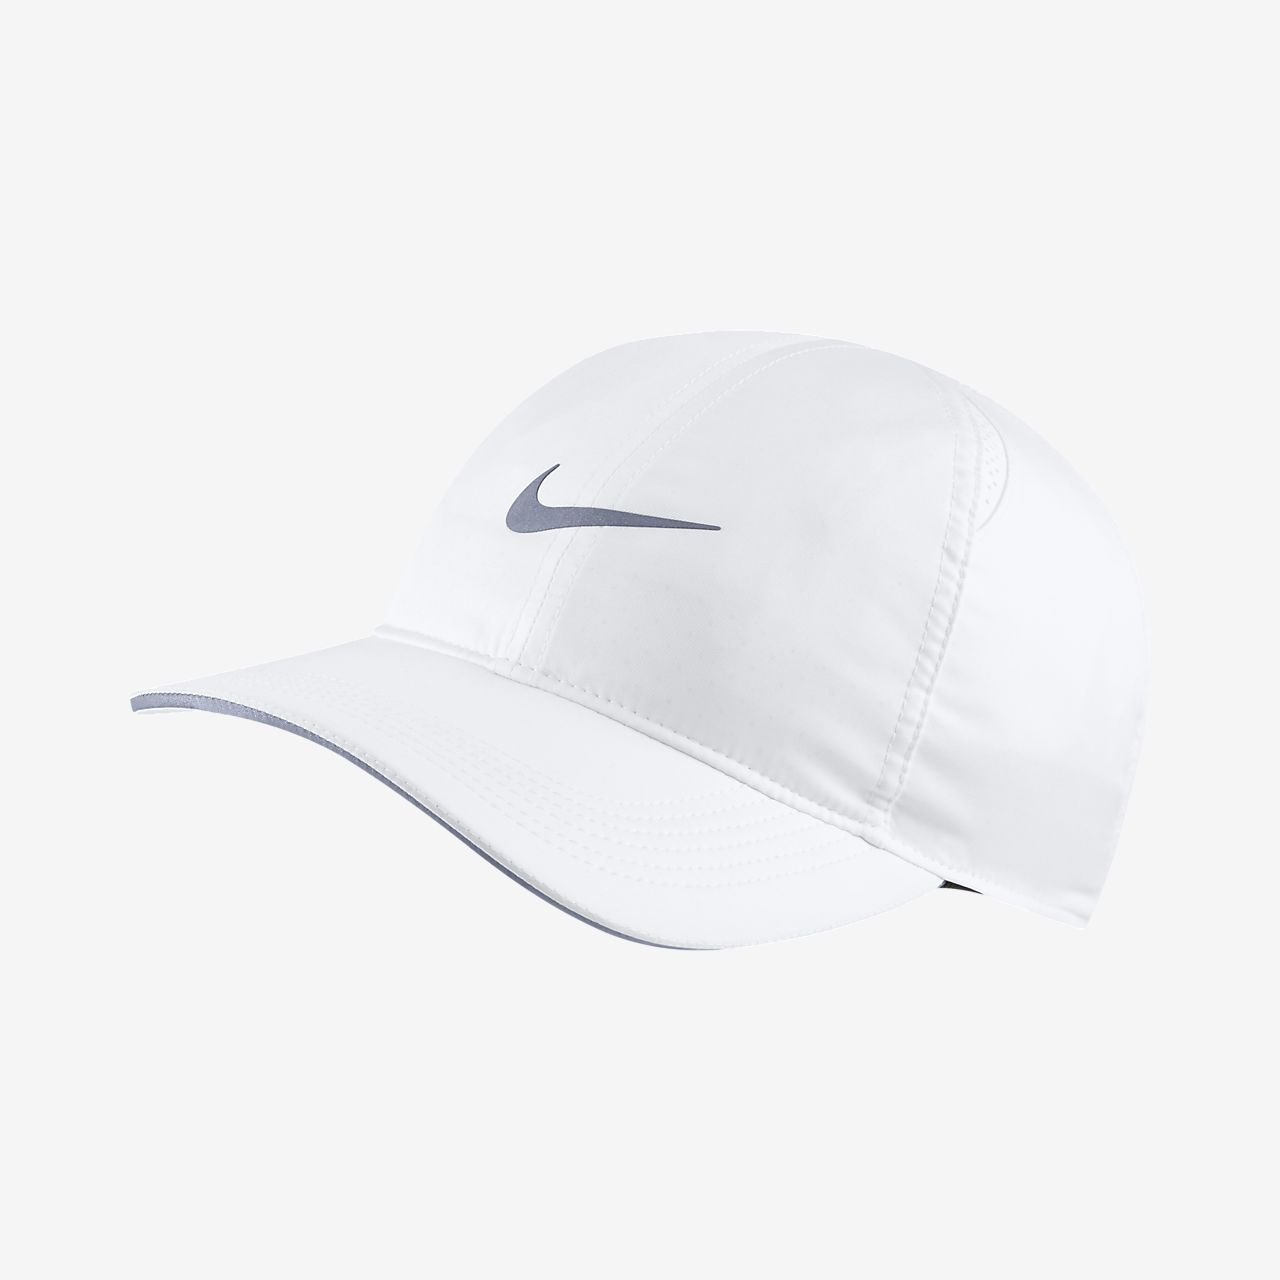 fbbadb04541 ... switzerland nike featherlight adjustable running hat 3ccb2 7b1e9